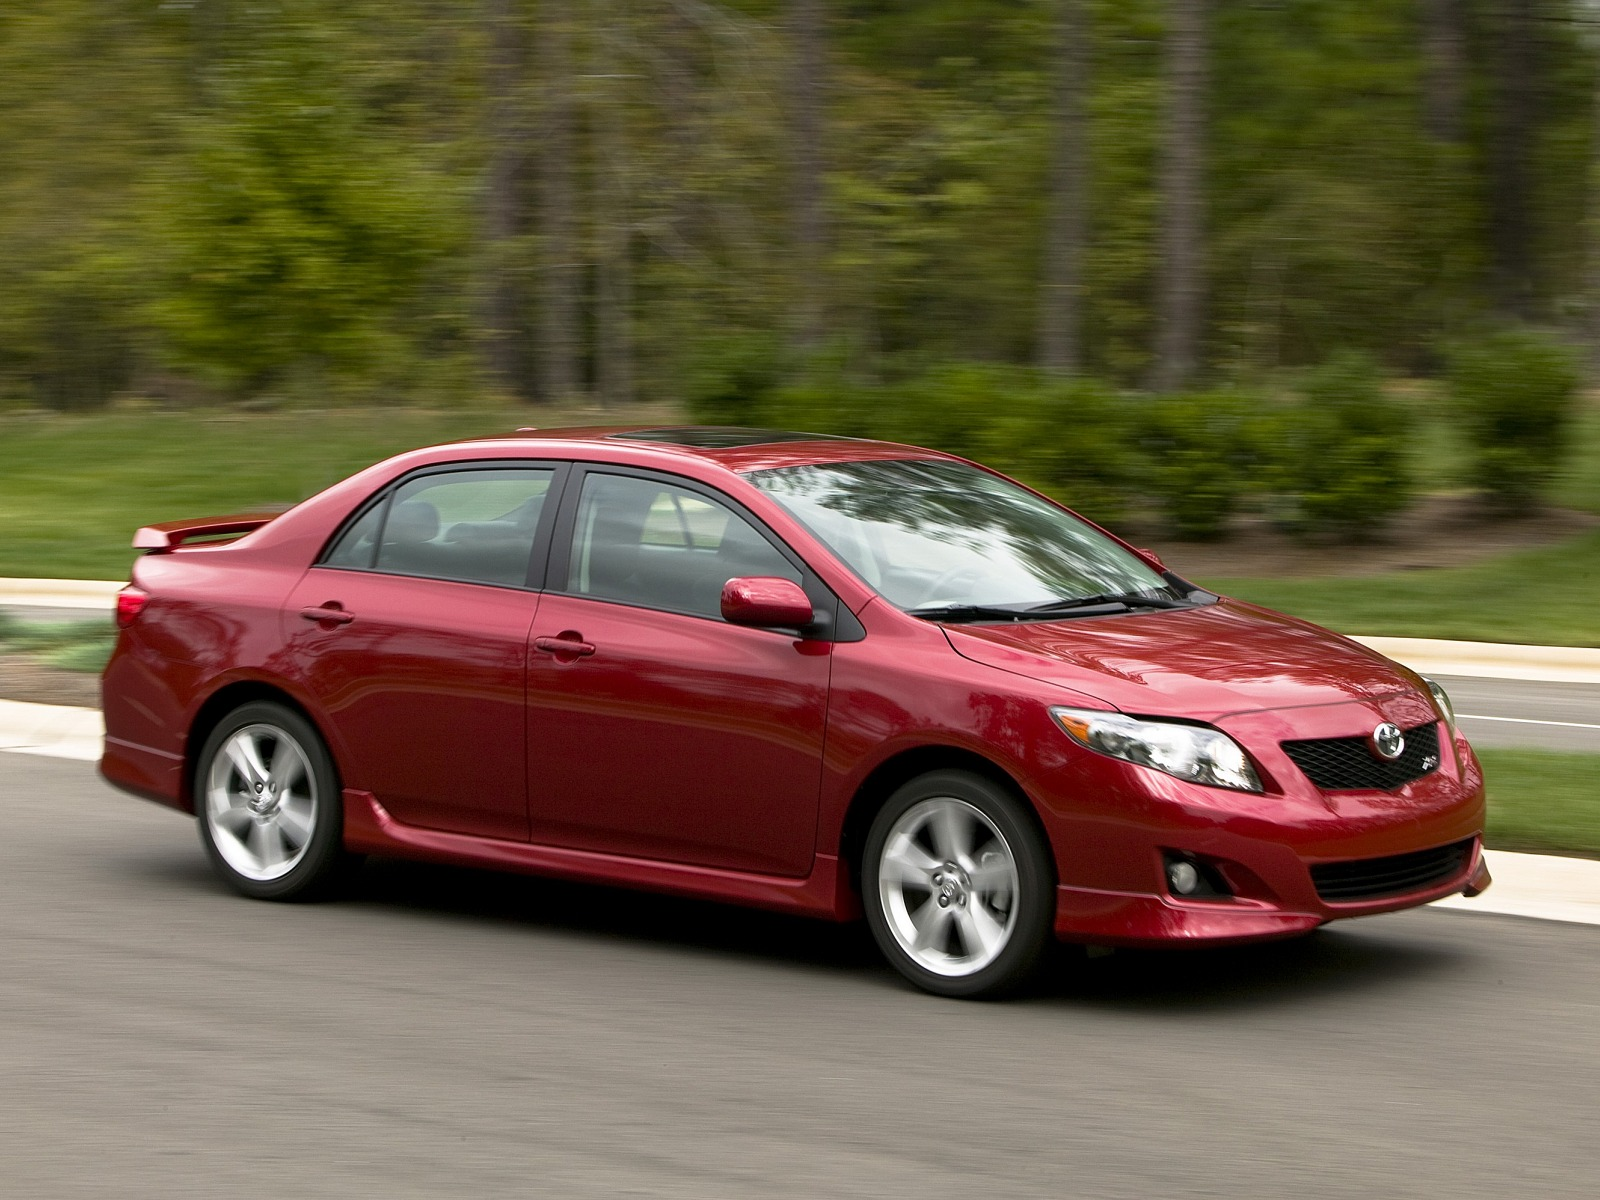 corolla toyota xrs 2009 front three sport sedan motor specifications technical